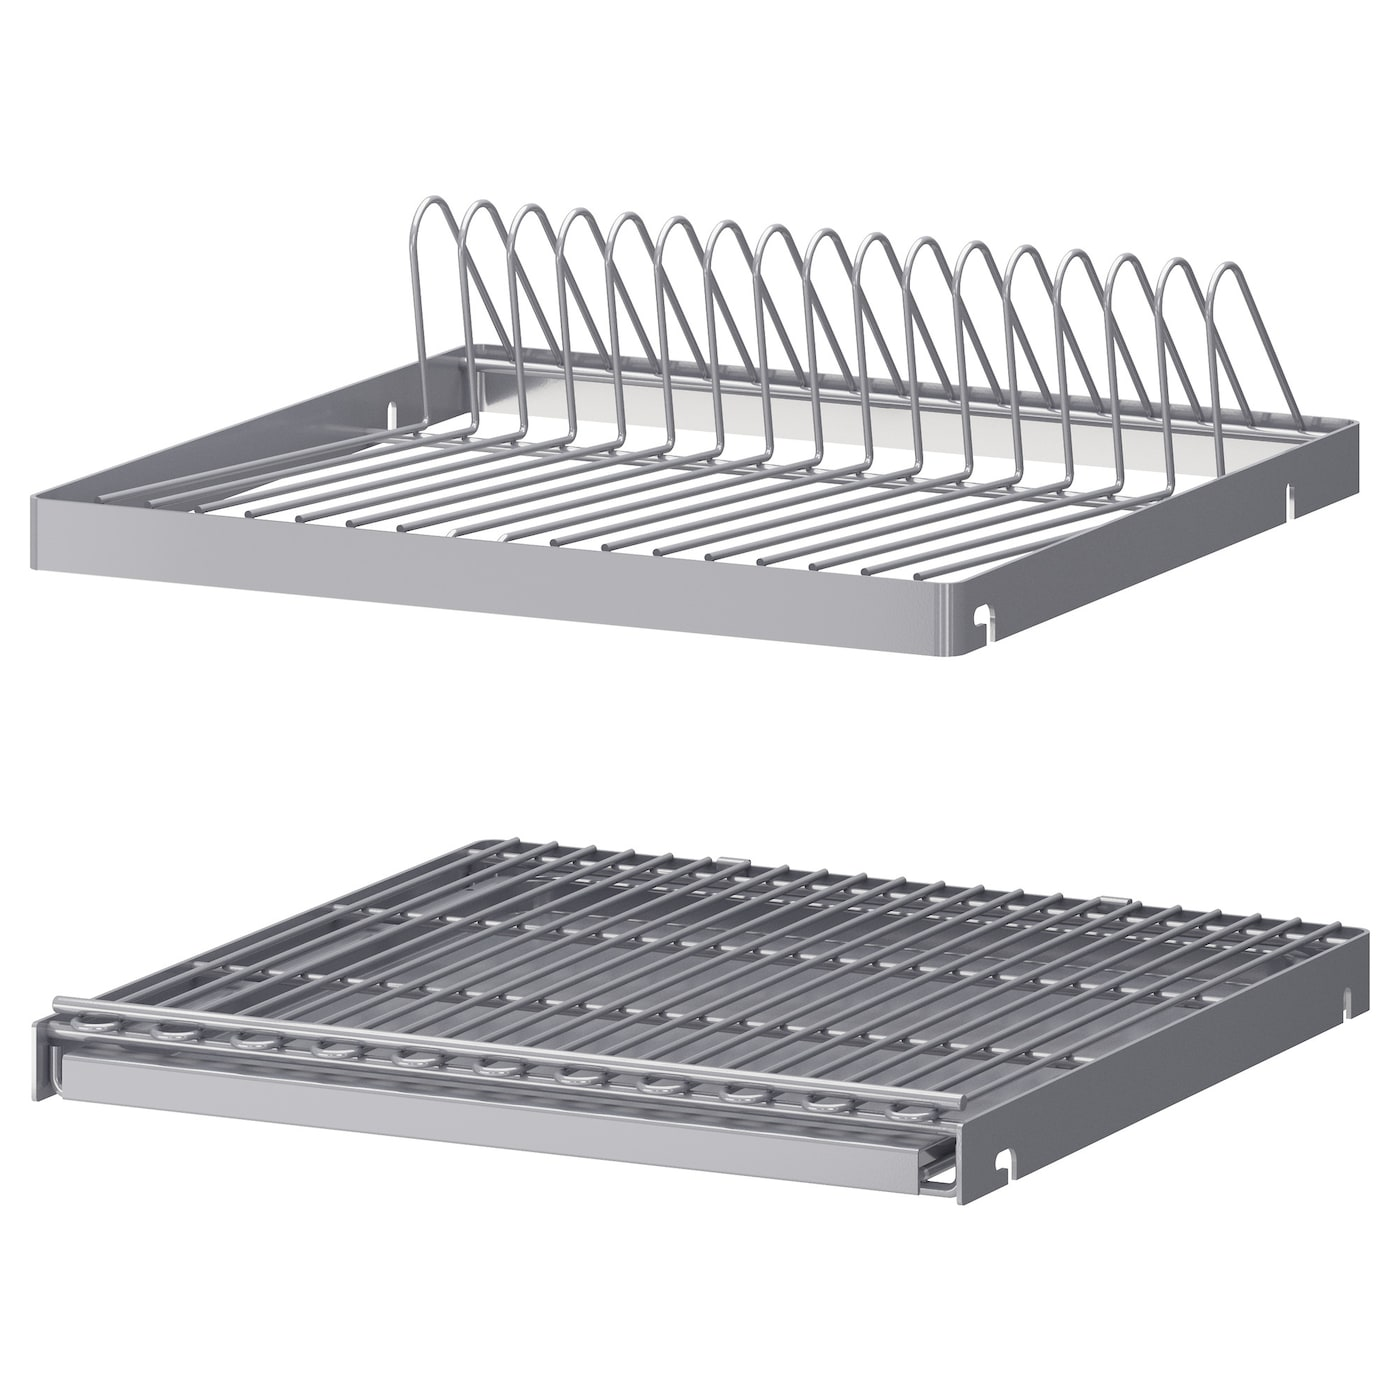 UTRUSTA Dish drainer for wall cabinet 40 x 35 cm - IKEA